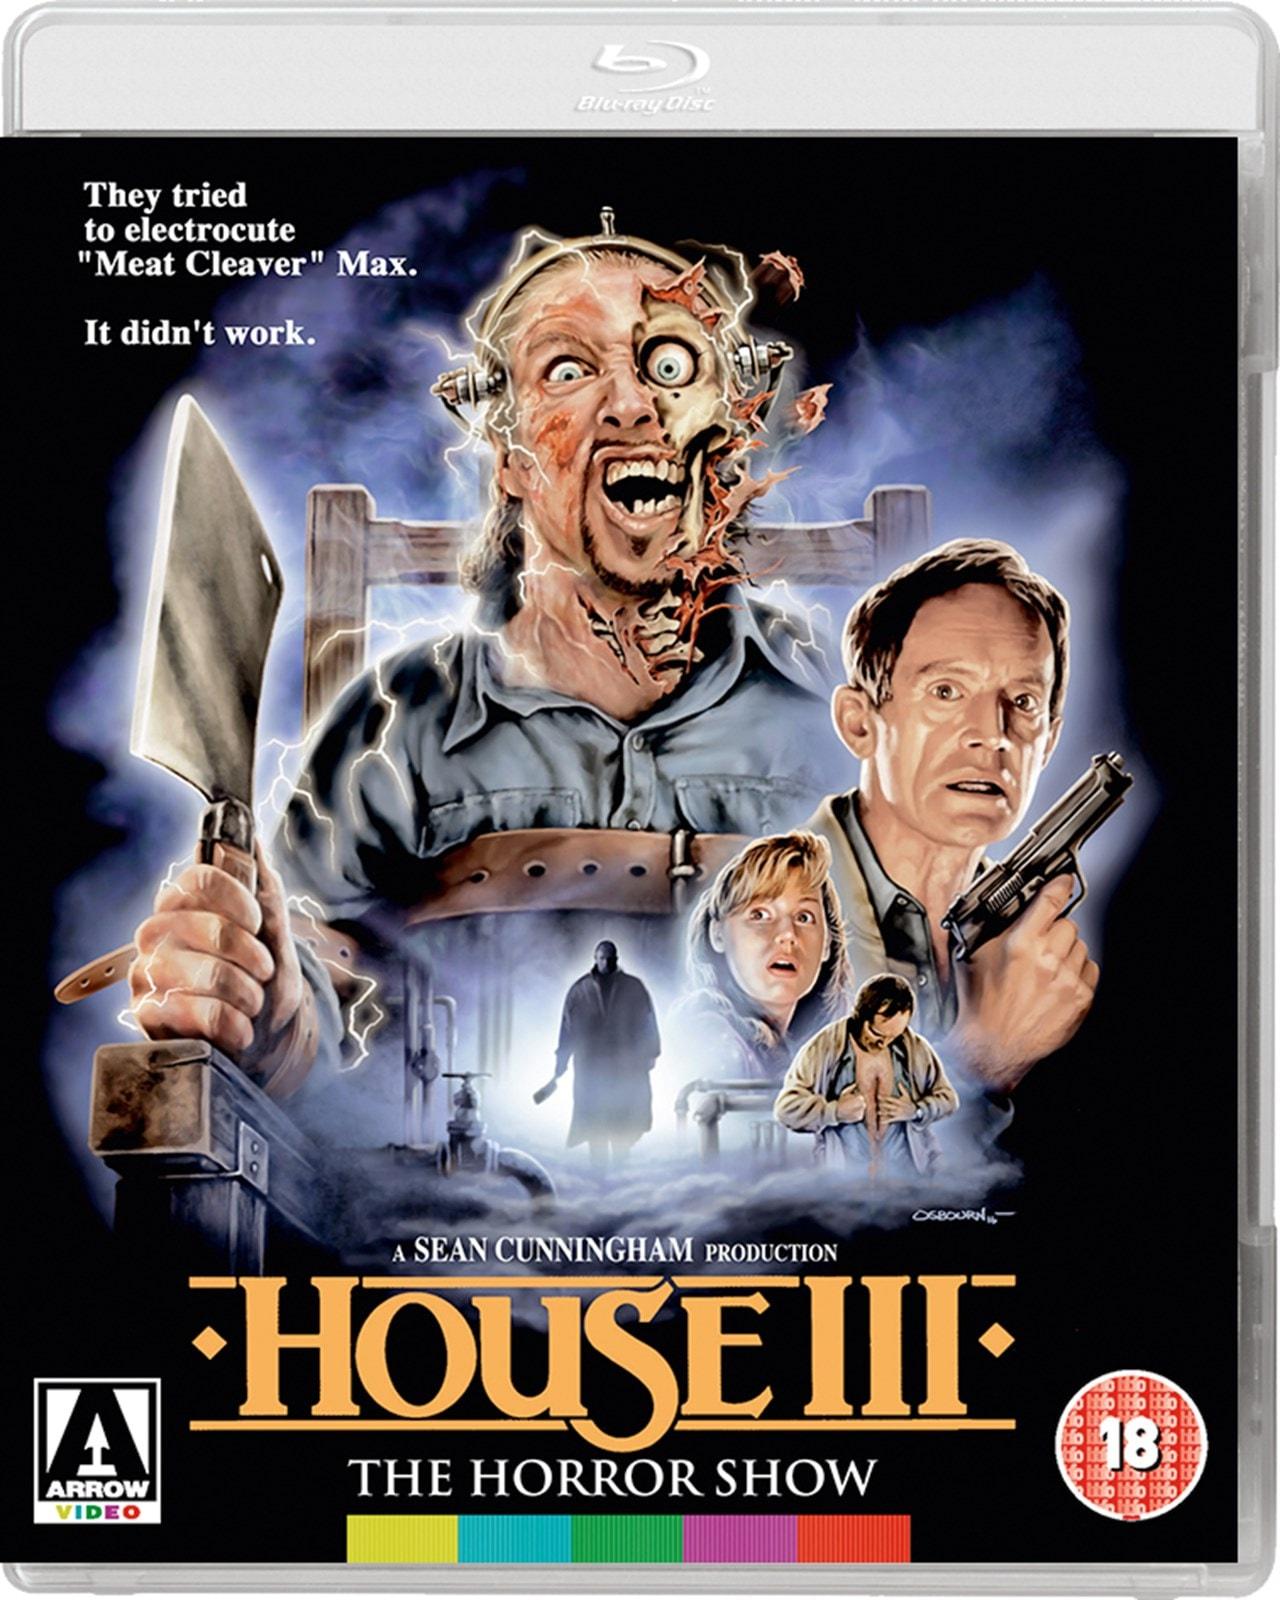 House III - The Horror Show - 1